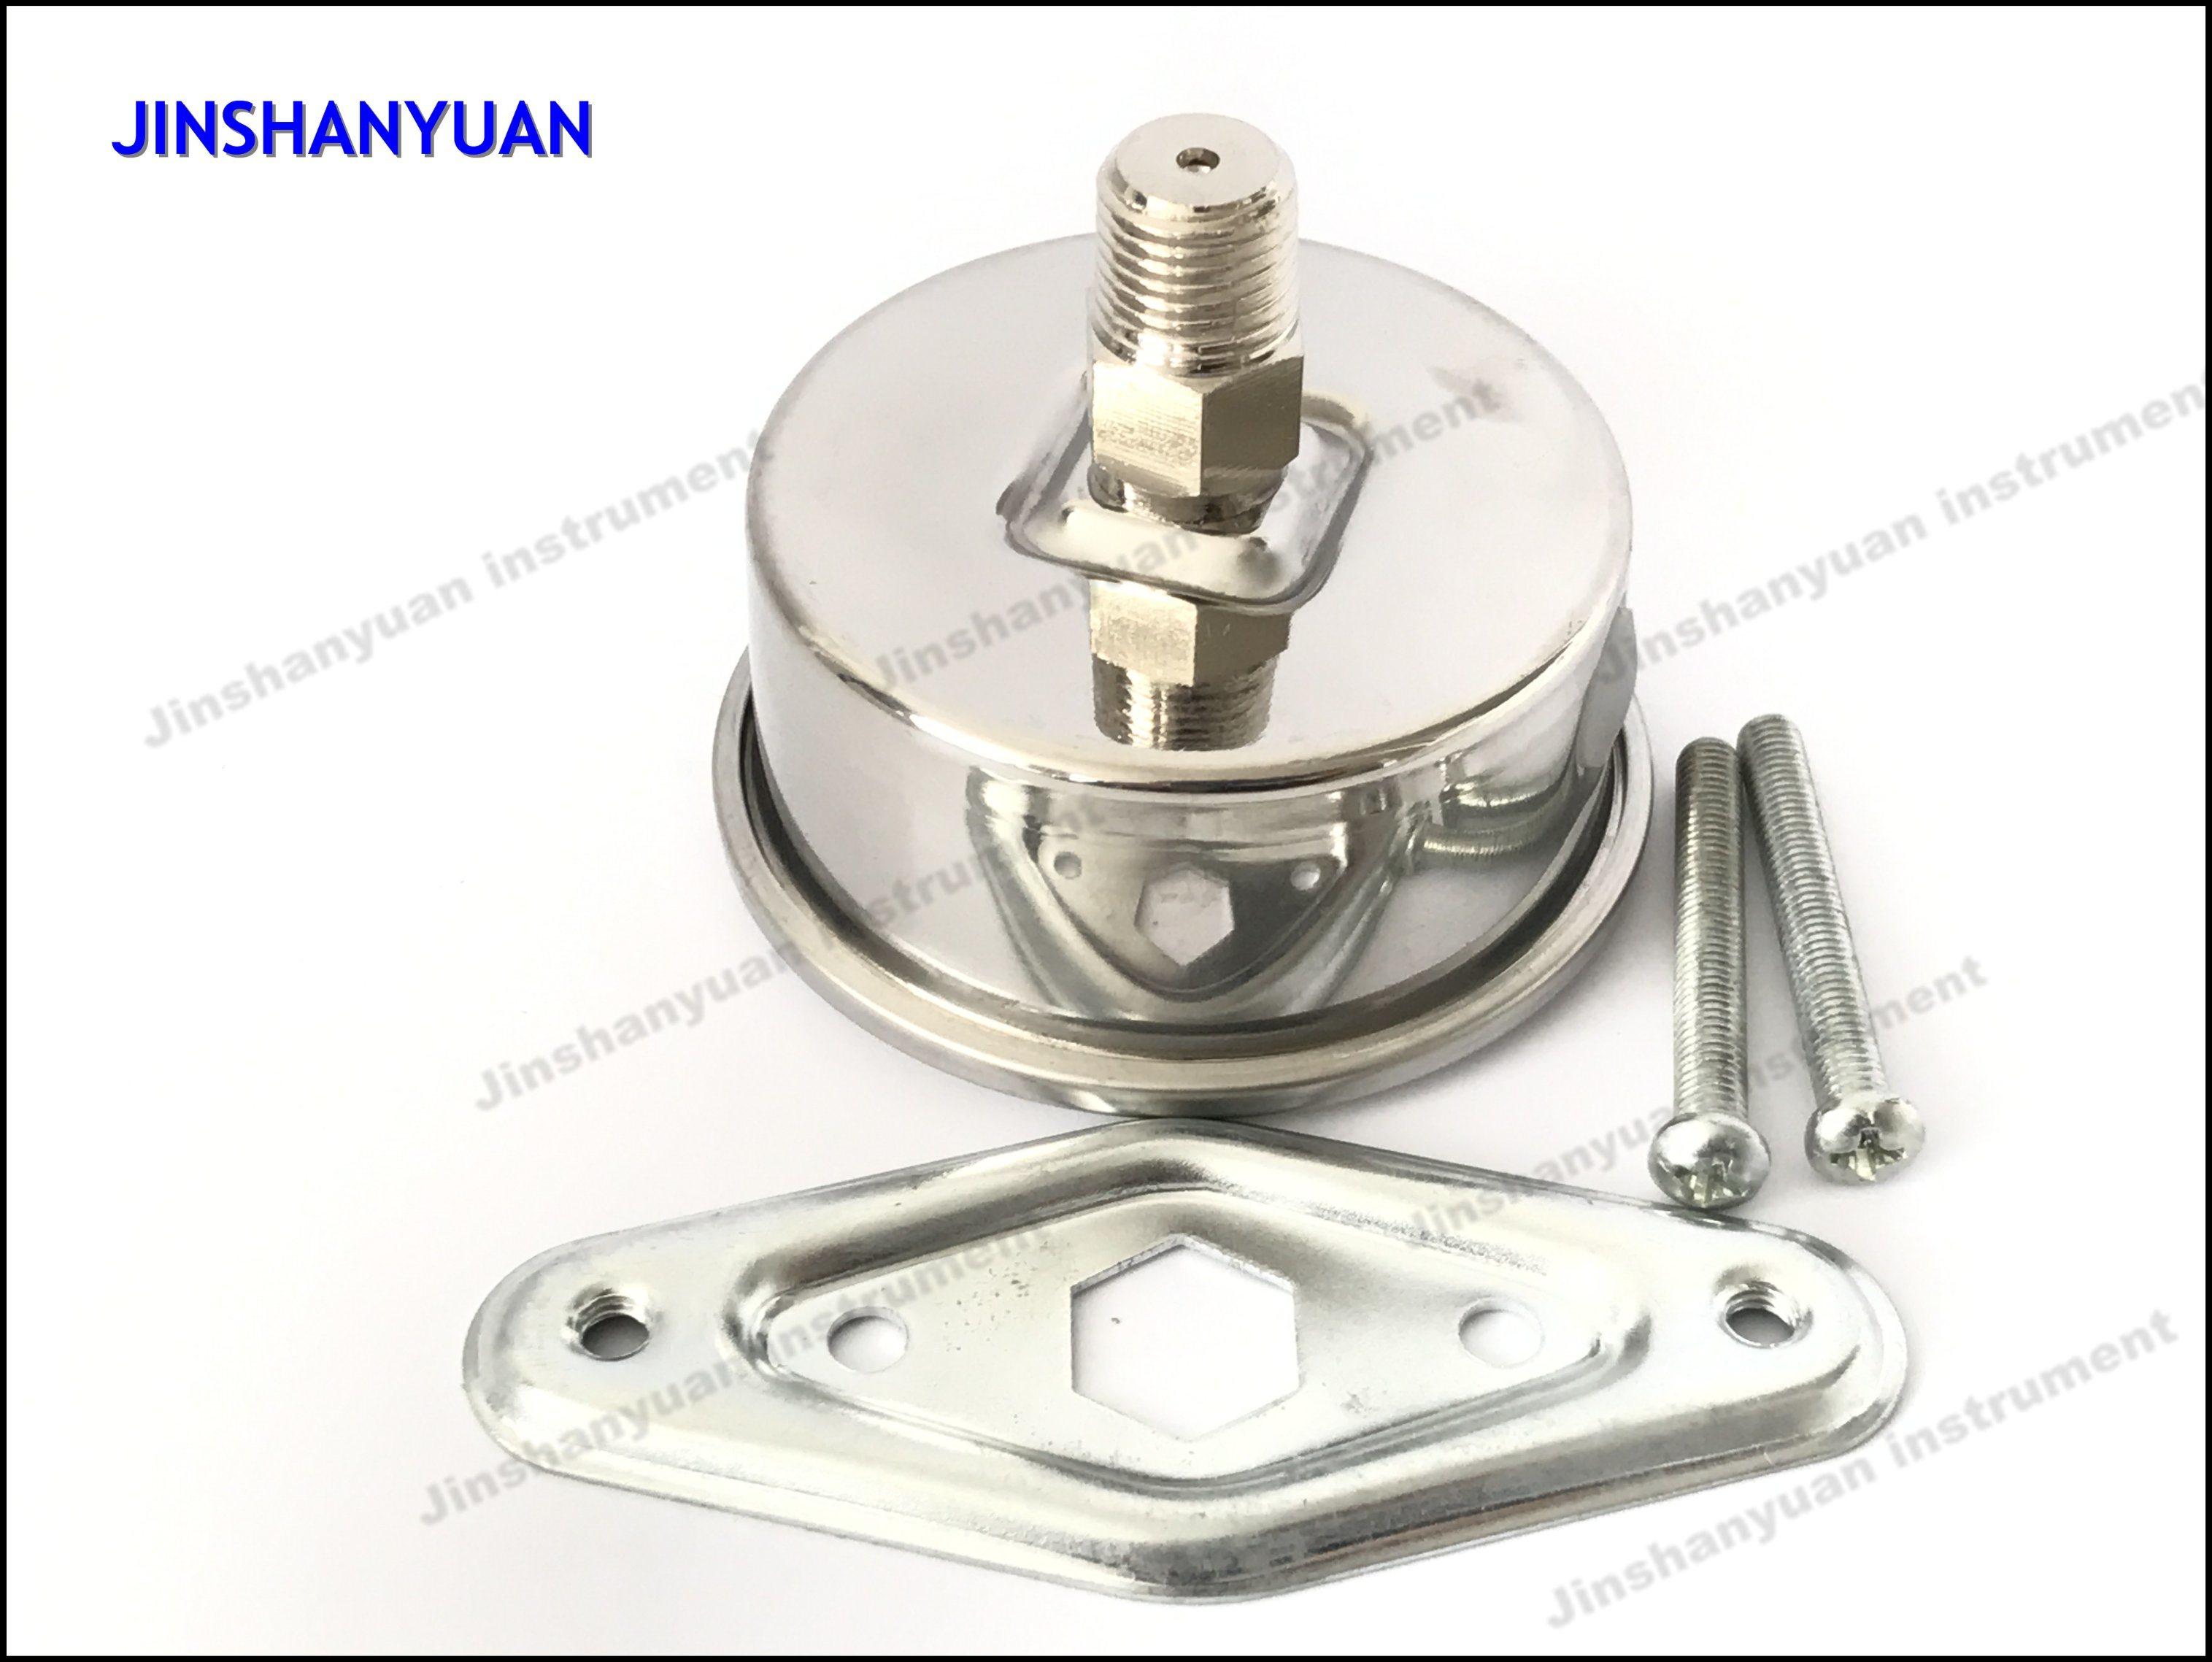 Og-006 Industrial Pressure Gauge with Clamp/Liquid Filled Manometer